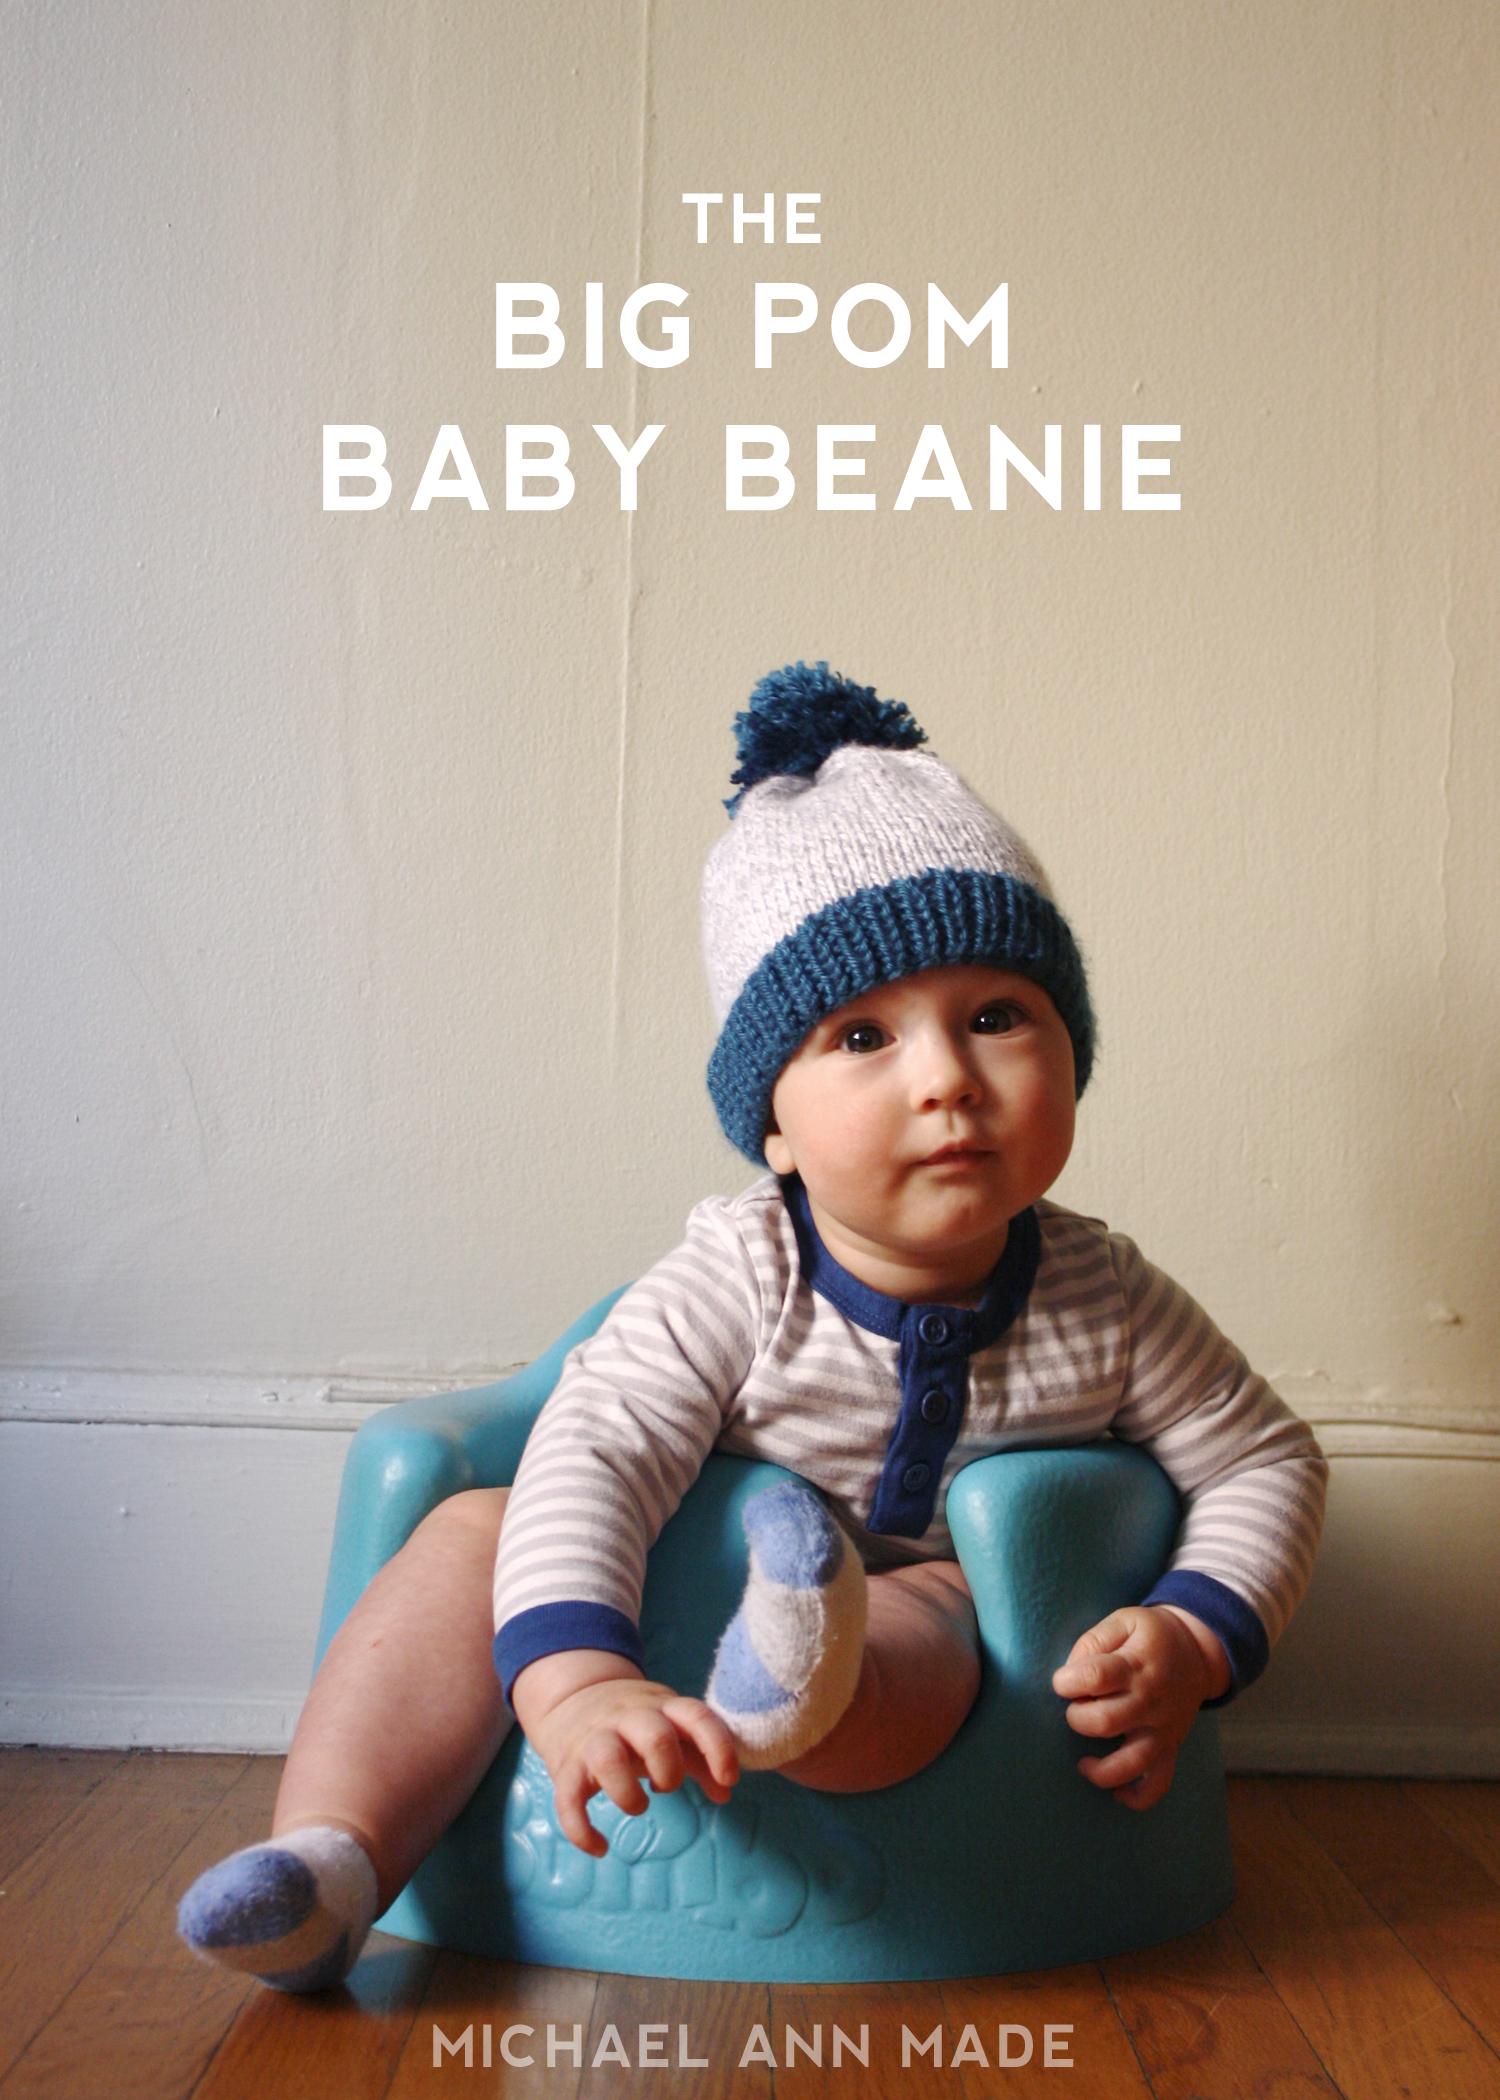 michael ann made : Big Pom Baby Beanie - Now With Free PDF Pattern!